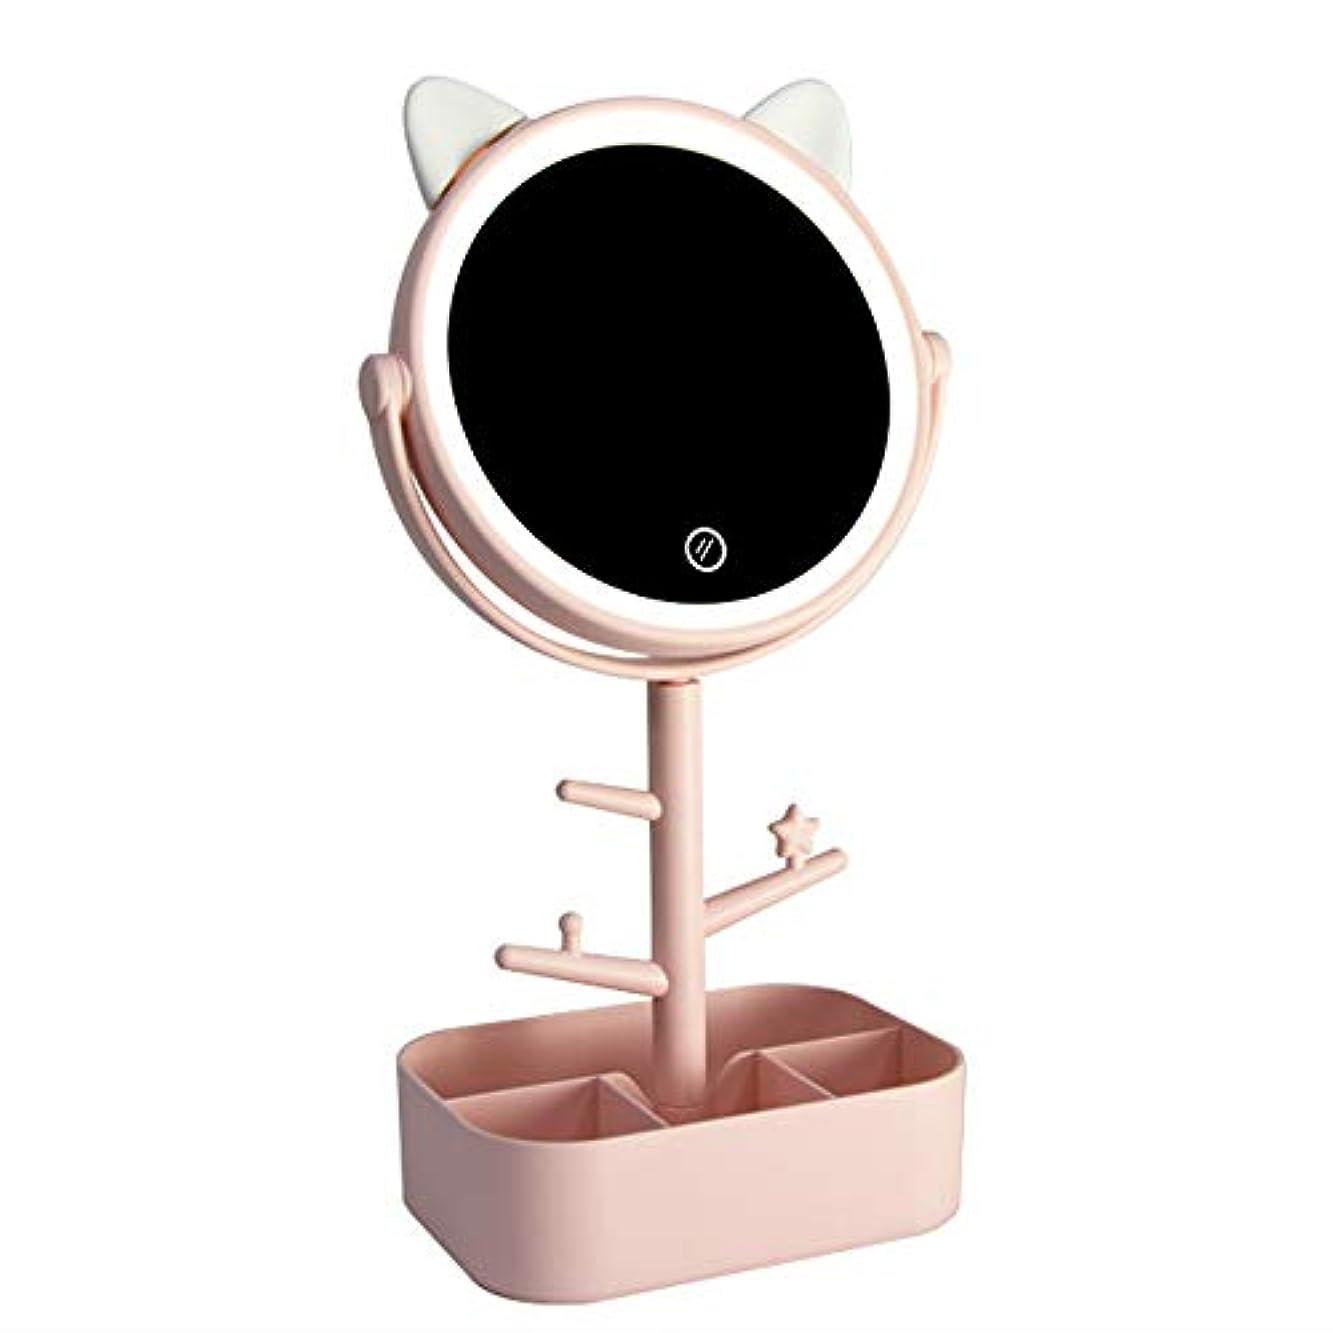 Lecone LED化粧鏡 女優ミラー 卓上ミラー 180度調整可能 スタンドミラー LEDライト メイク 化粧道具 円型 収納ケース 可収納 USB給電 (猫ーピンク)